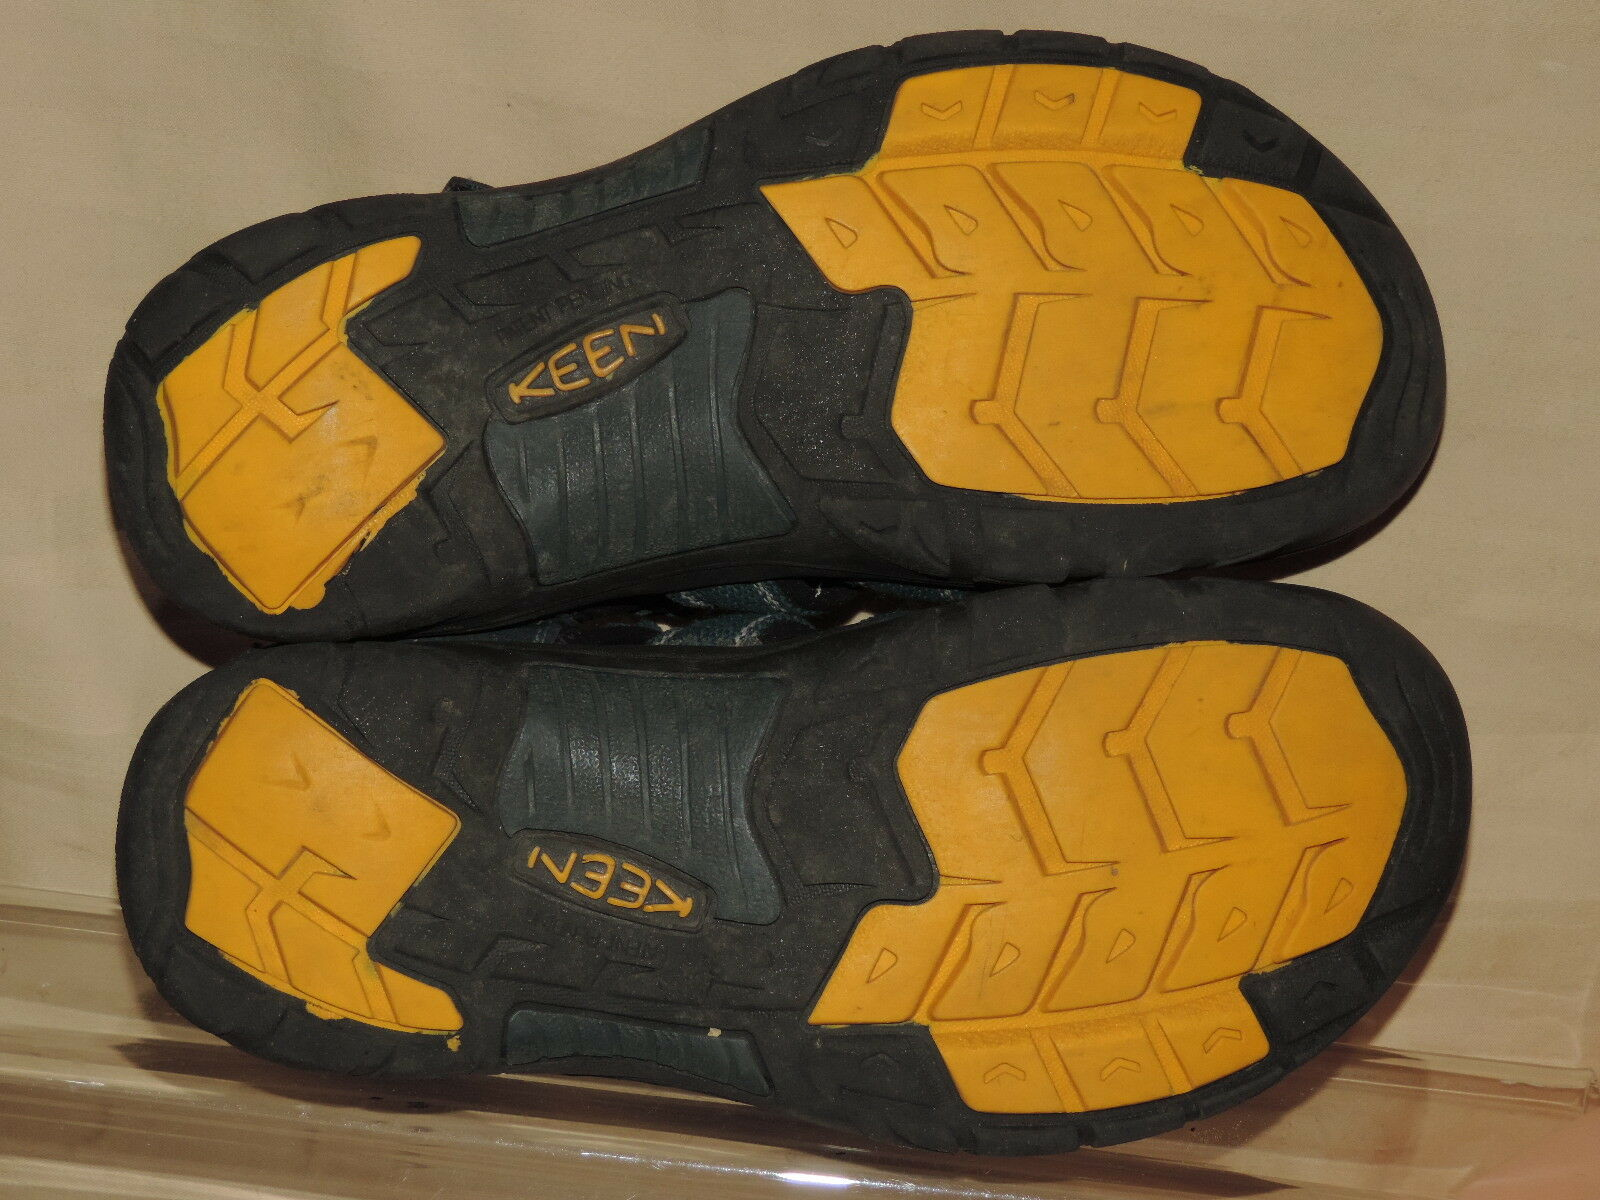 Keen H2 Newport style Navy Blue Sandals Hike Trail Beach Water Sandals Blue 23ed85